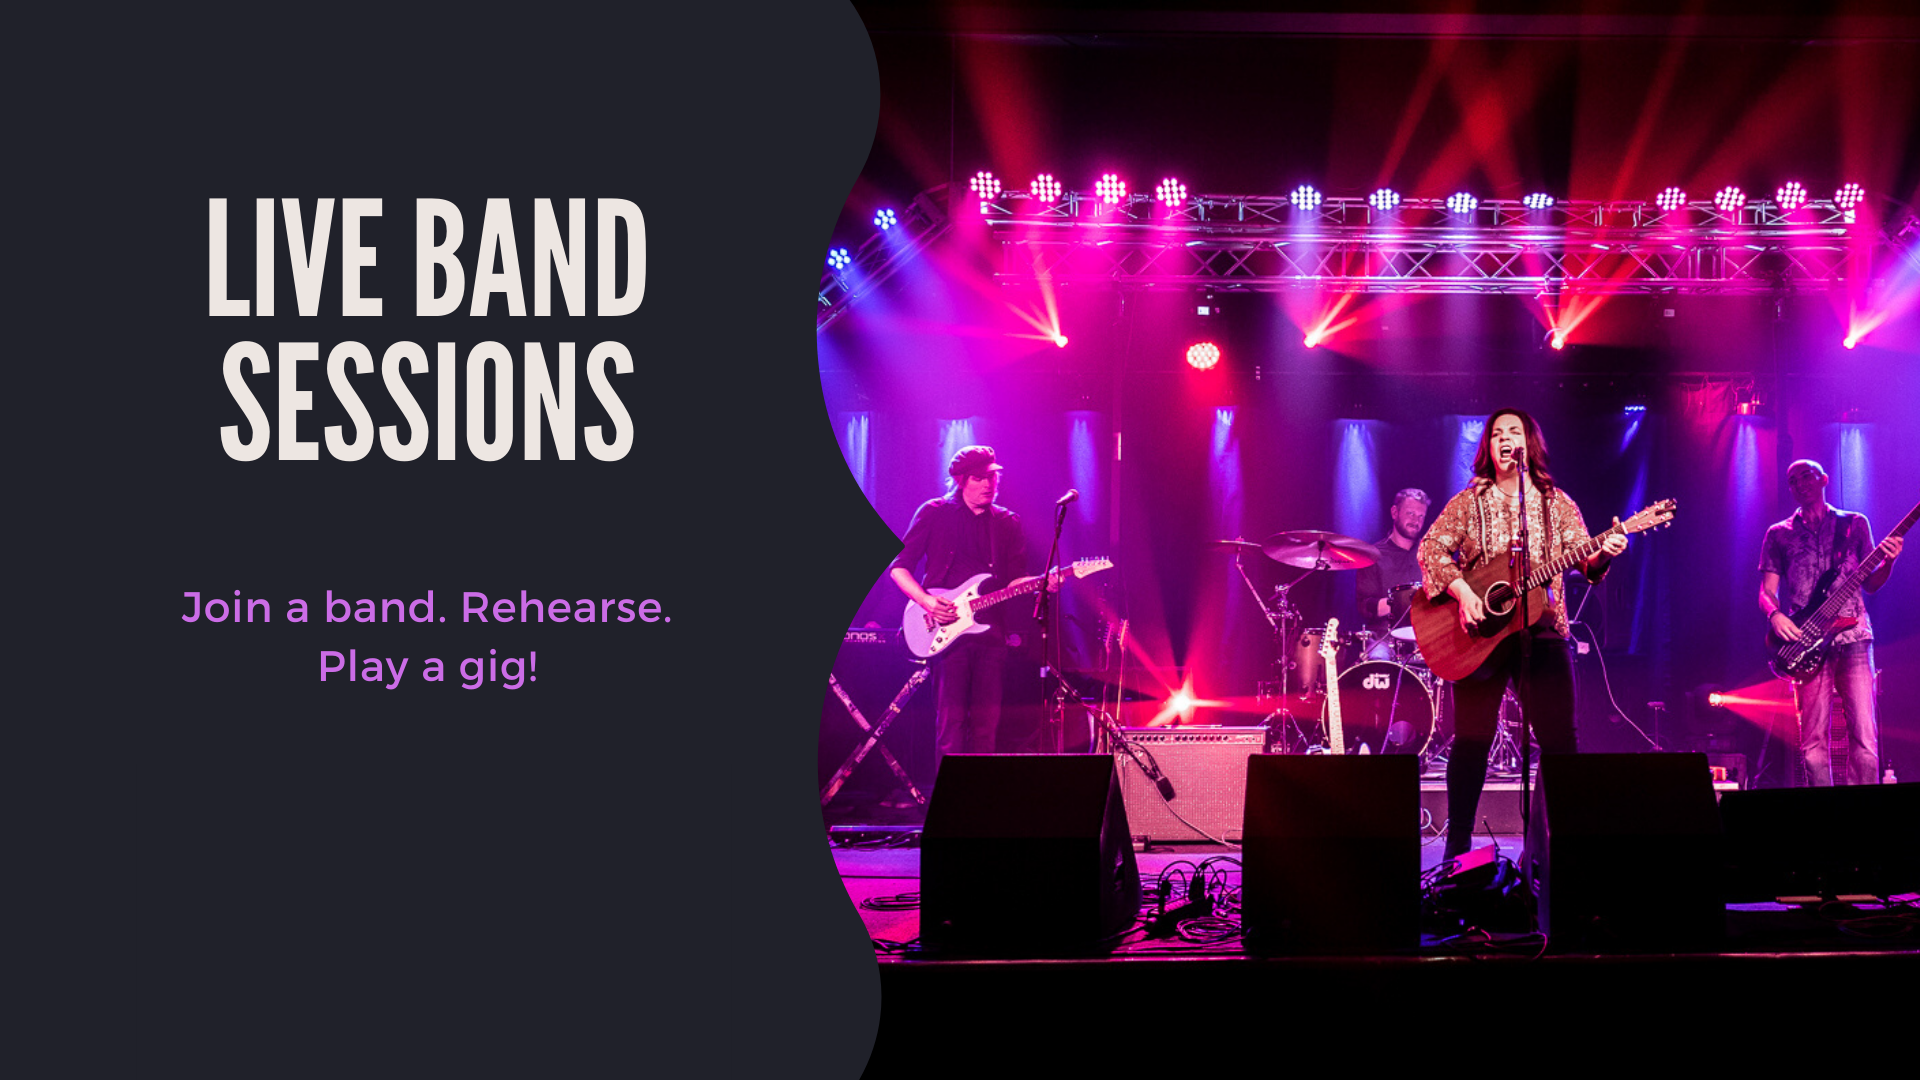 Live band sessions